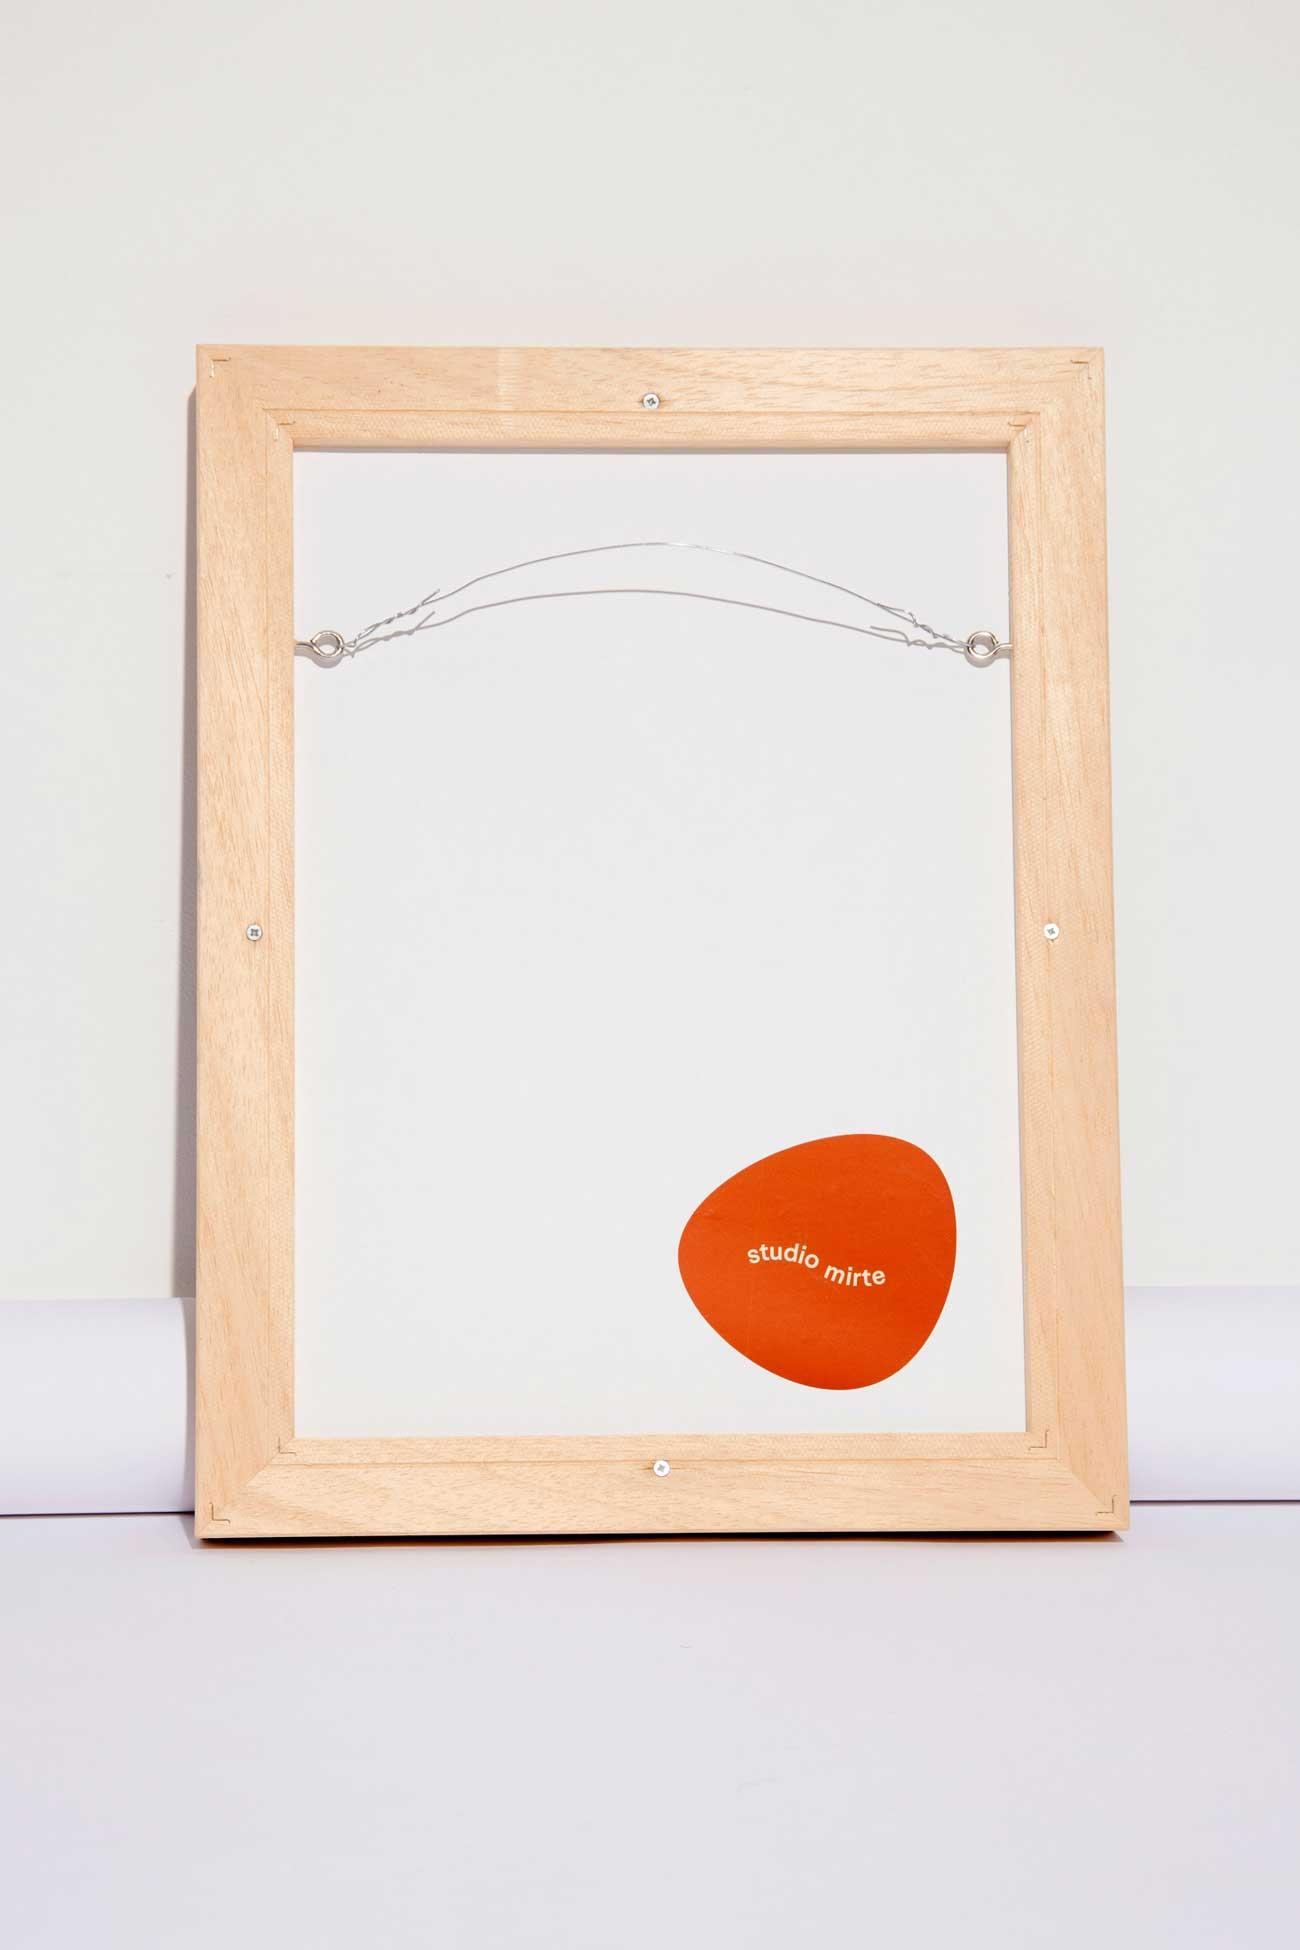 studio mirte van kooten framed rug small back